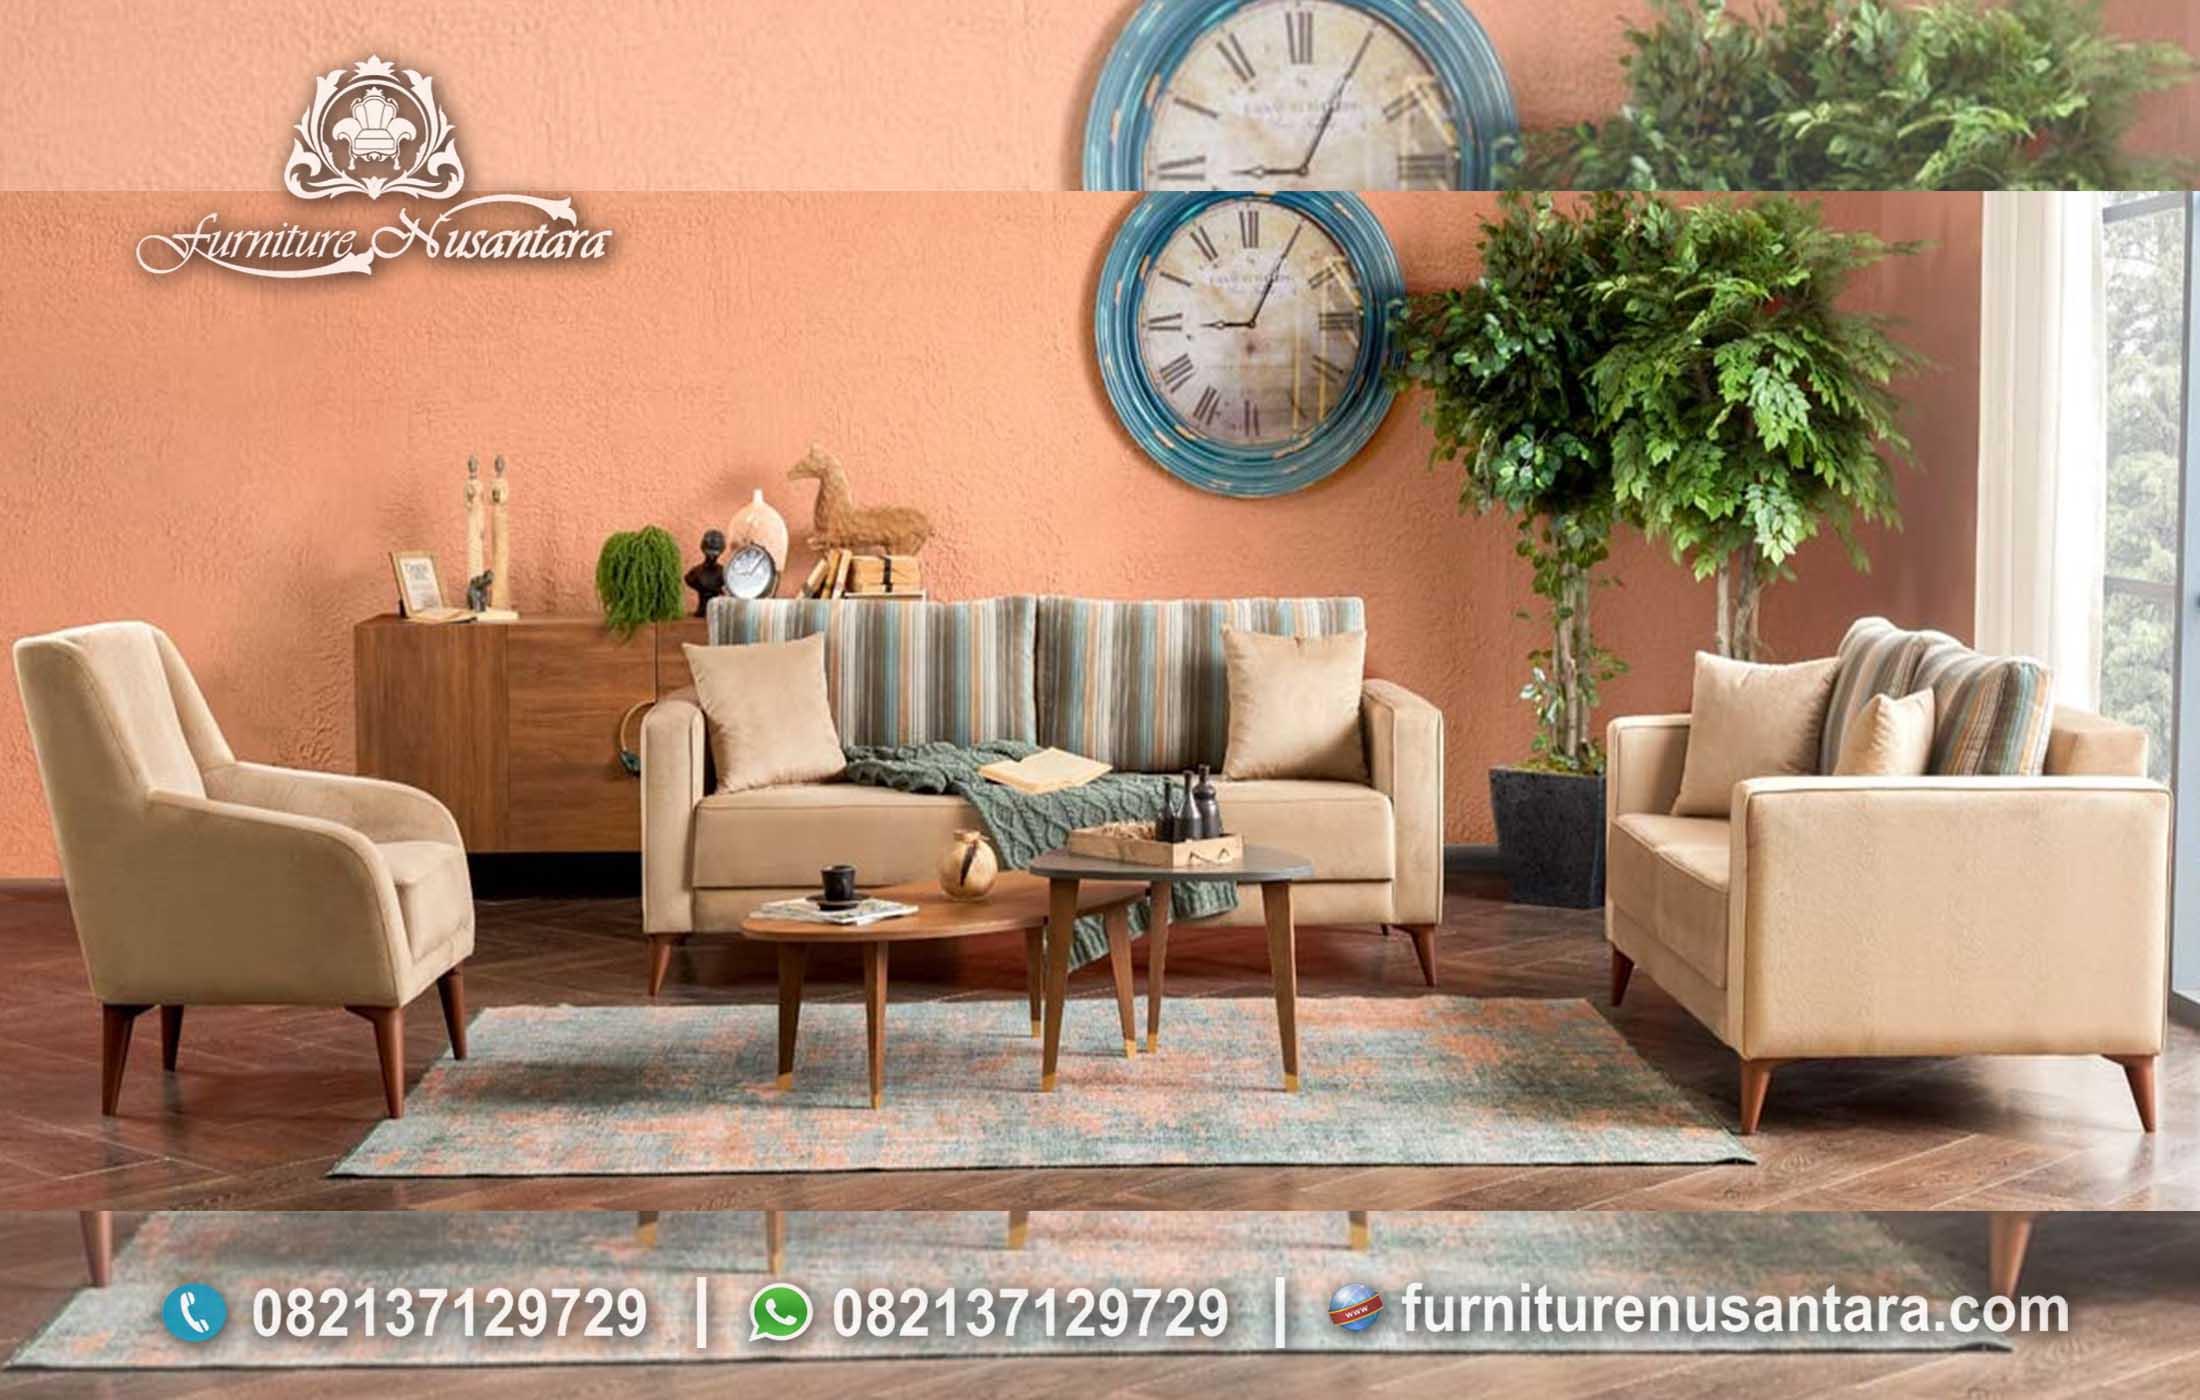 Desain Kursi Sofa Minimalis Modern Kekinian ST-60, Furniture Nusantara